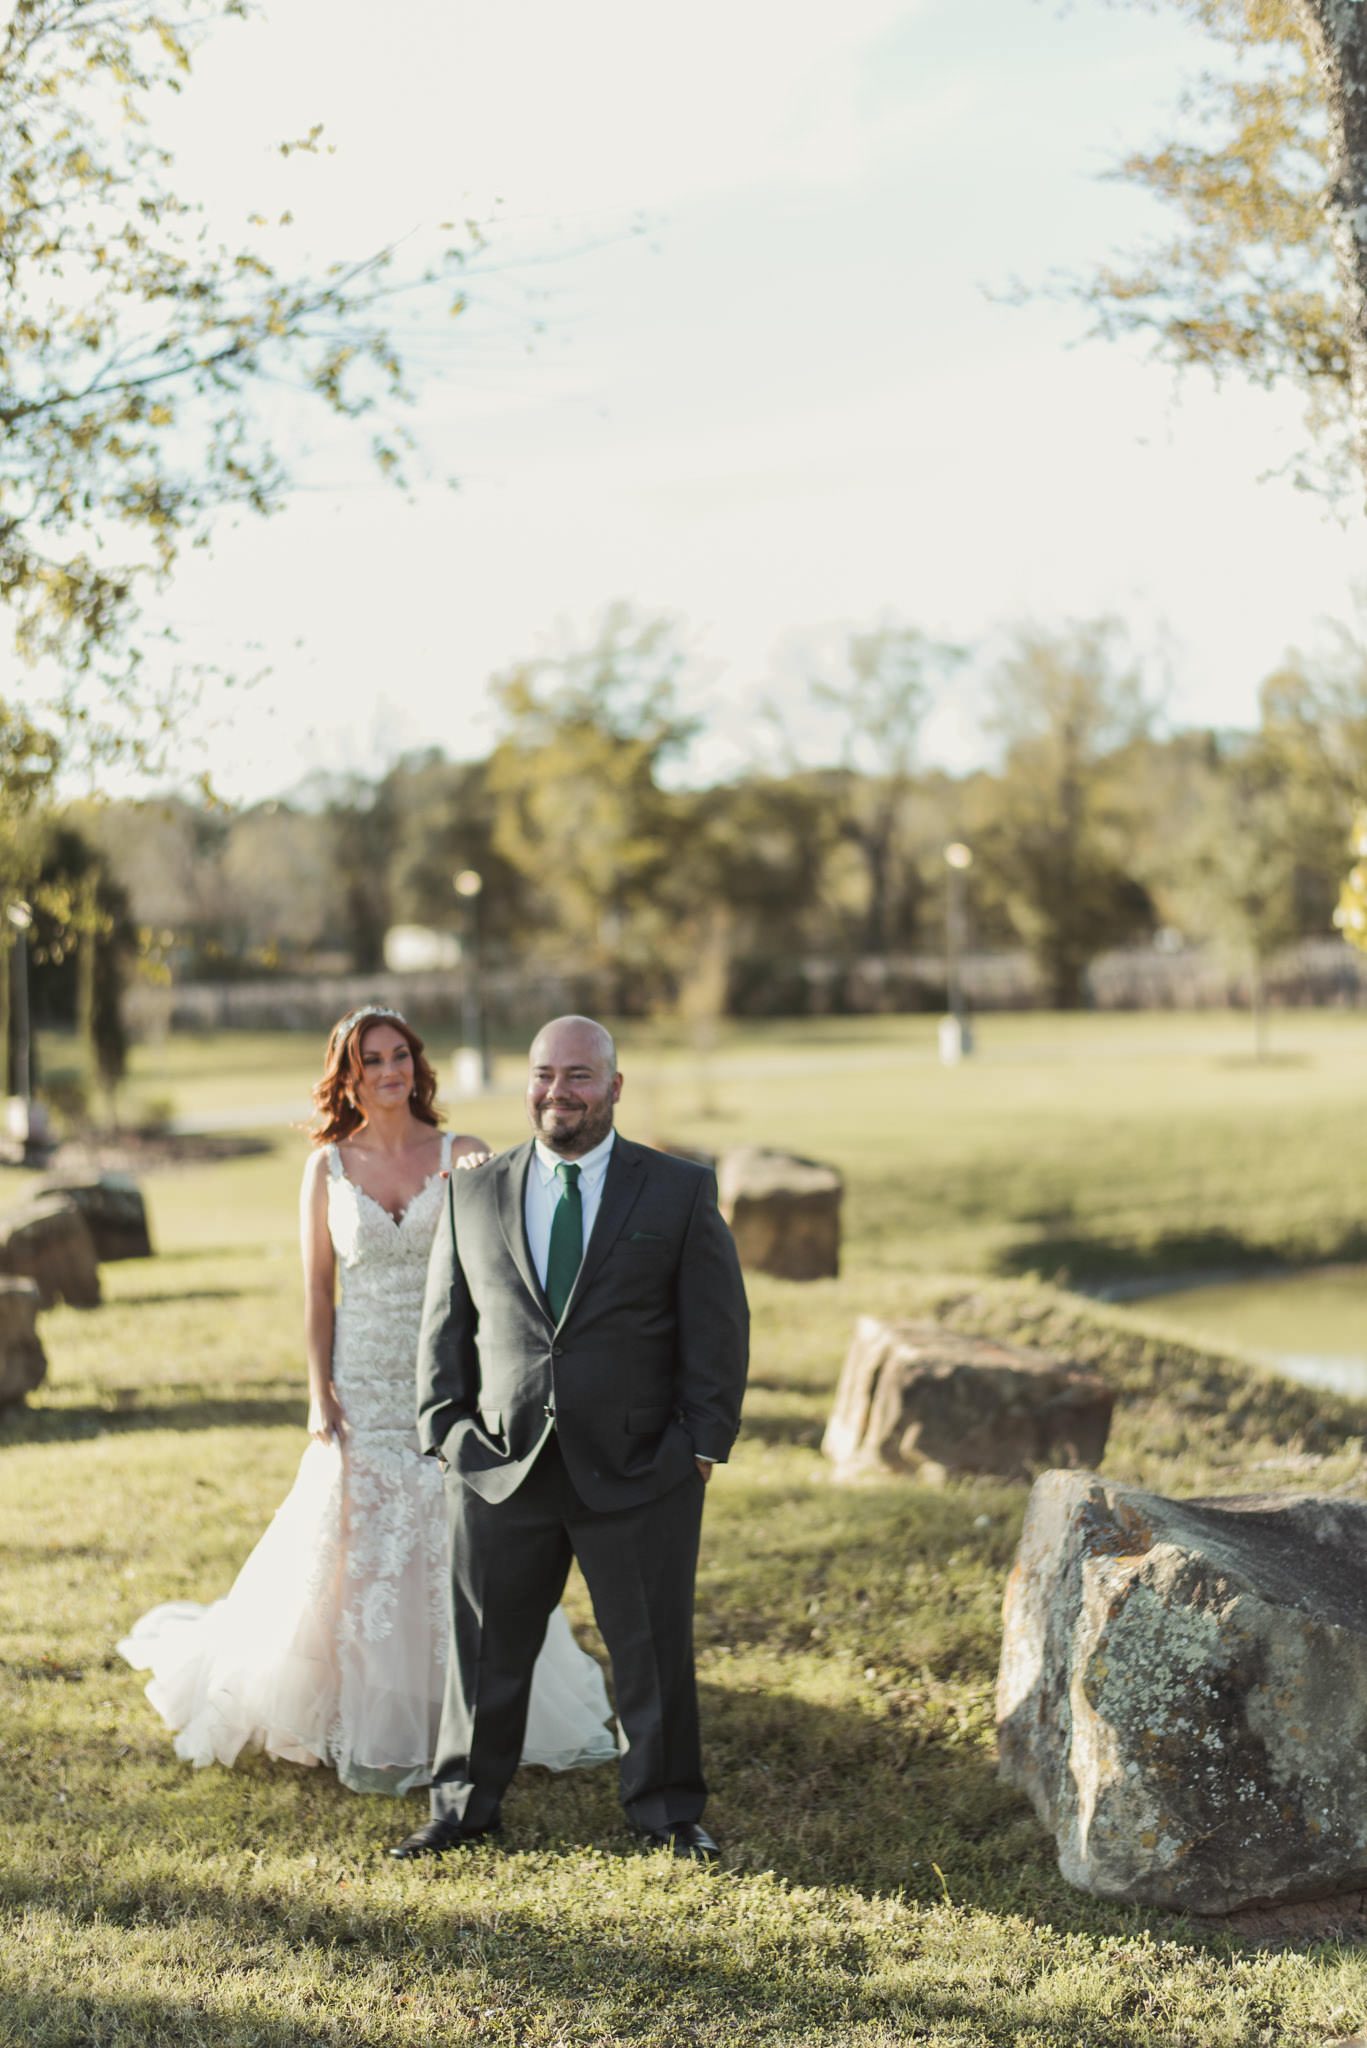 Cynthia-Curtis-Olde-Dobbine-Station-Houston-Wedding-Photographer-sm-45.jpg